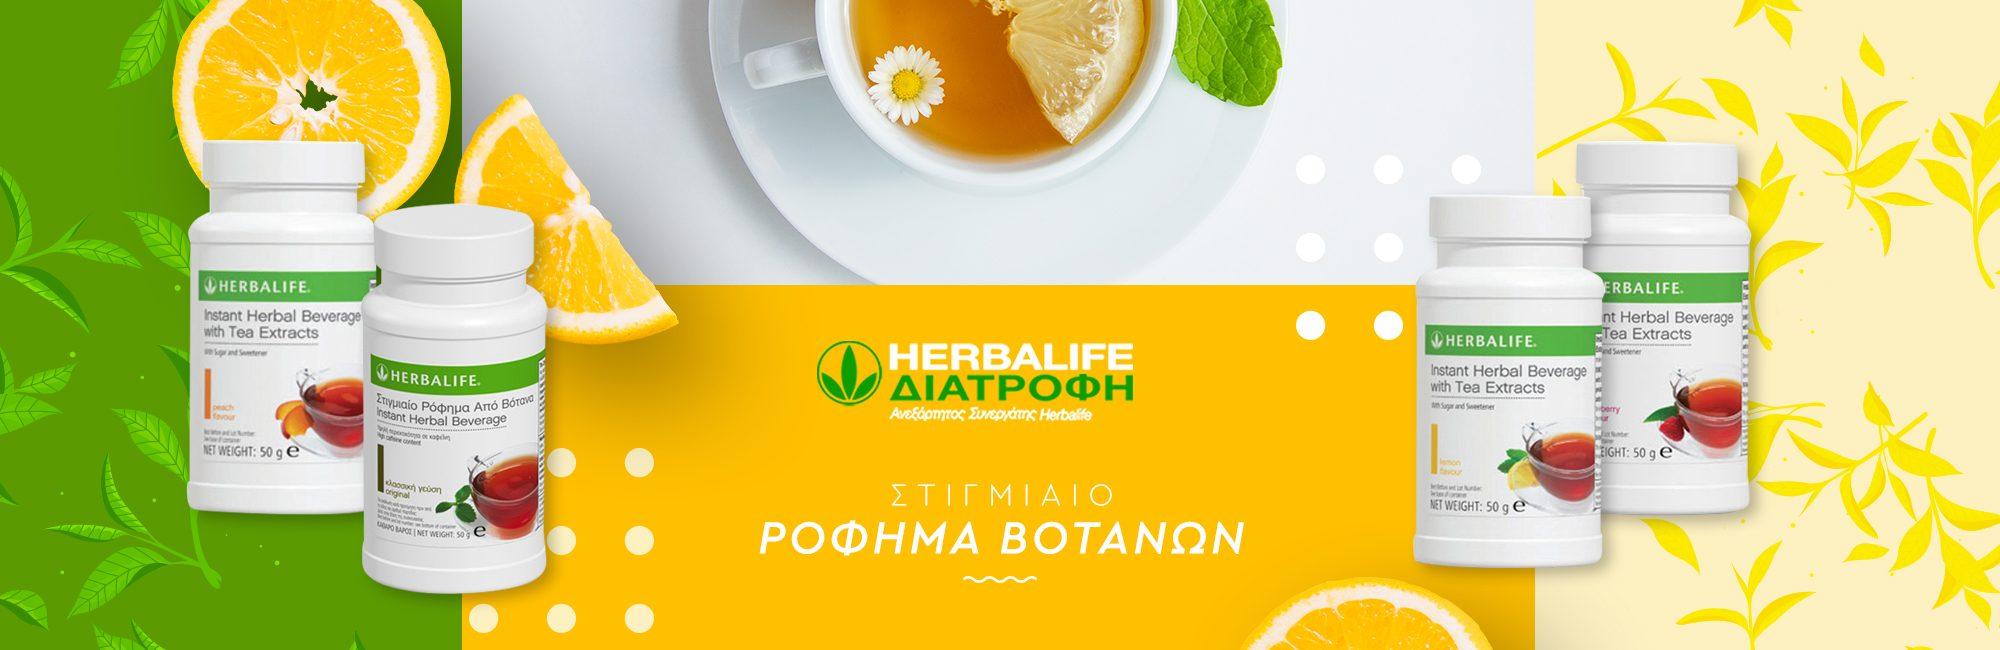 herbalife-banners-2000x650-tea